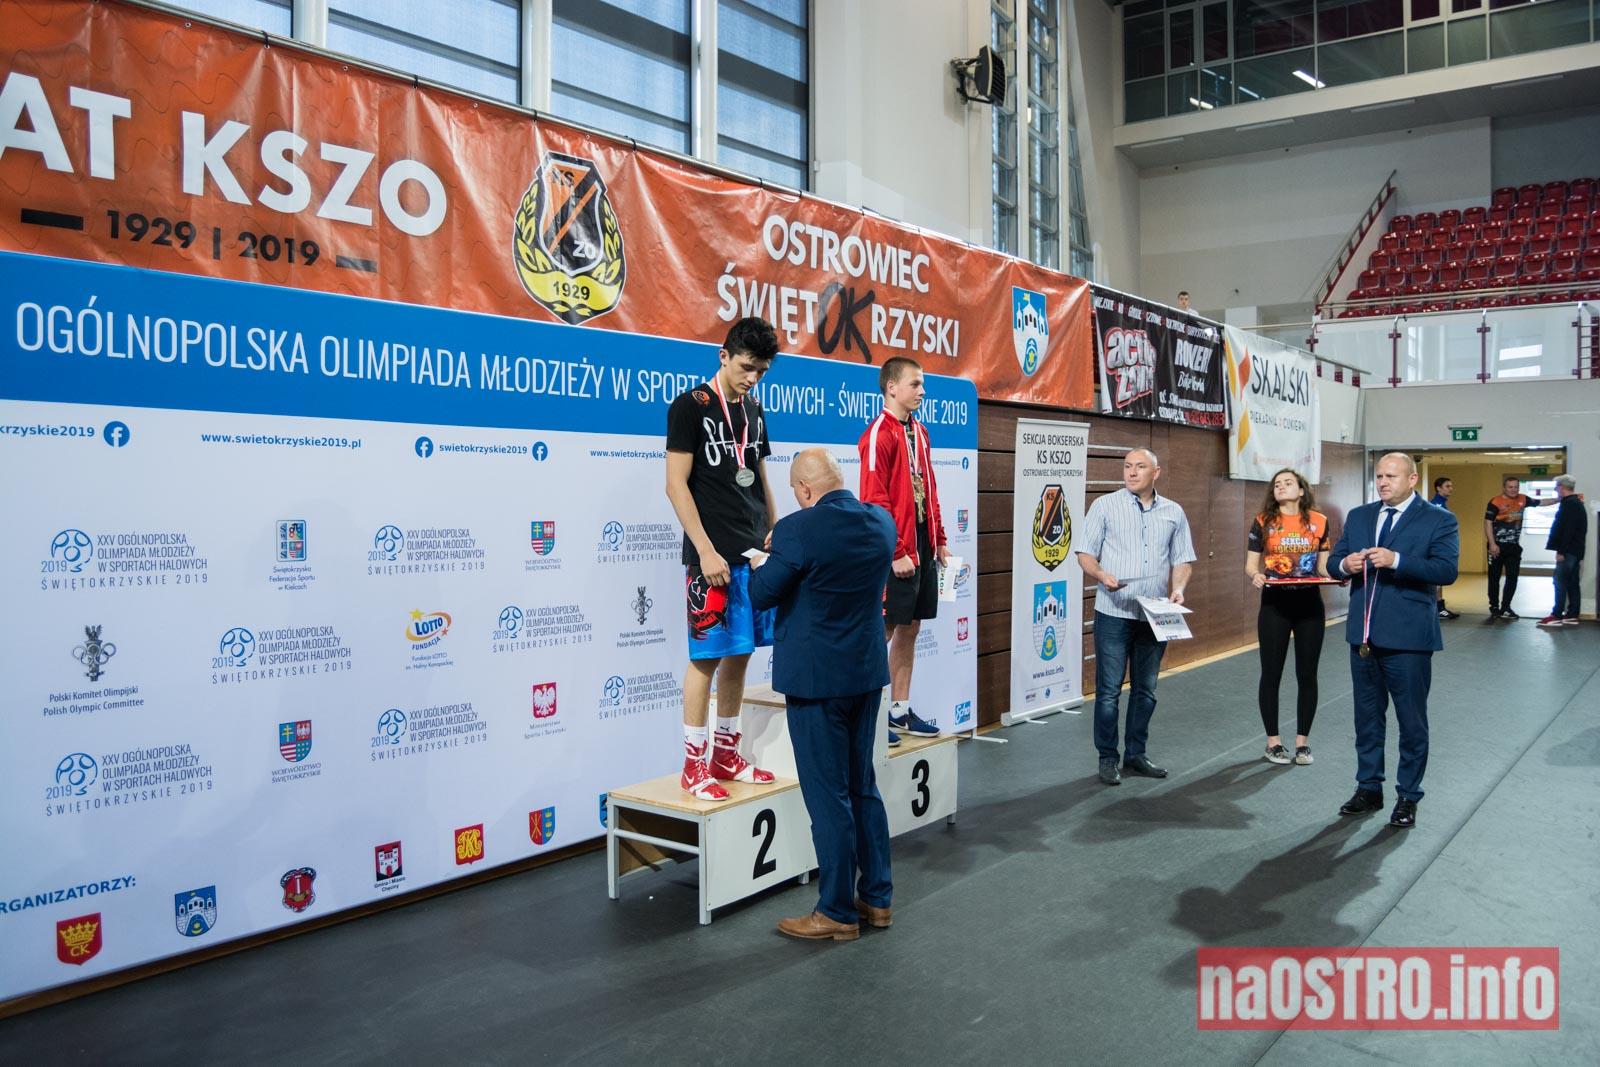 NaOSTRO BOKS Olimpiada-73